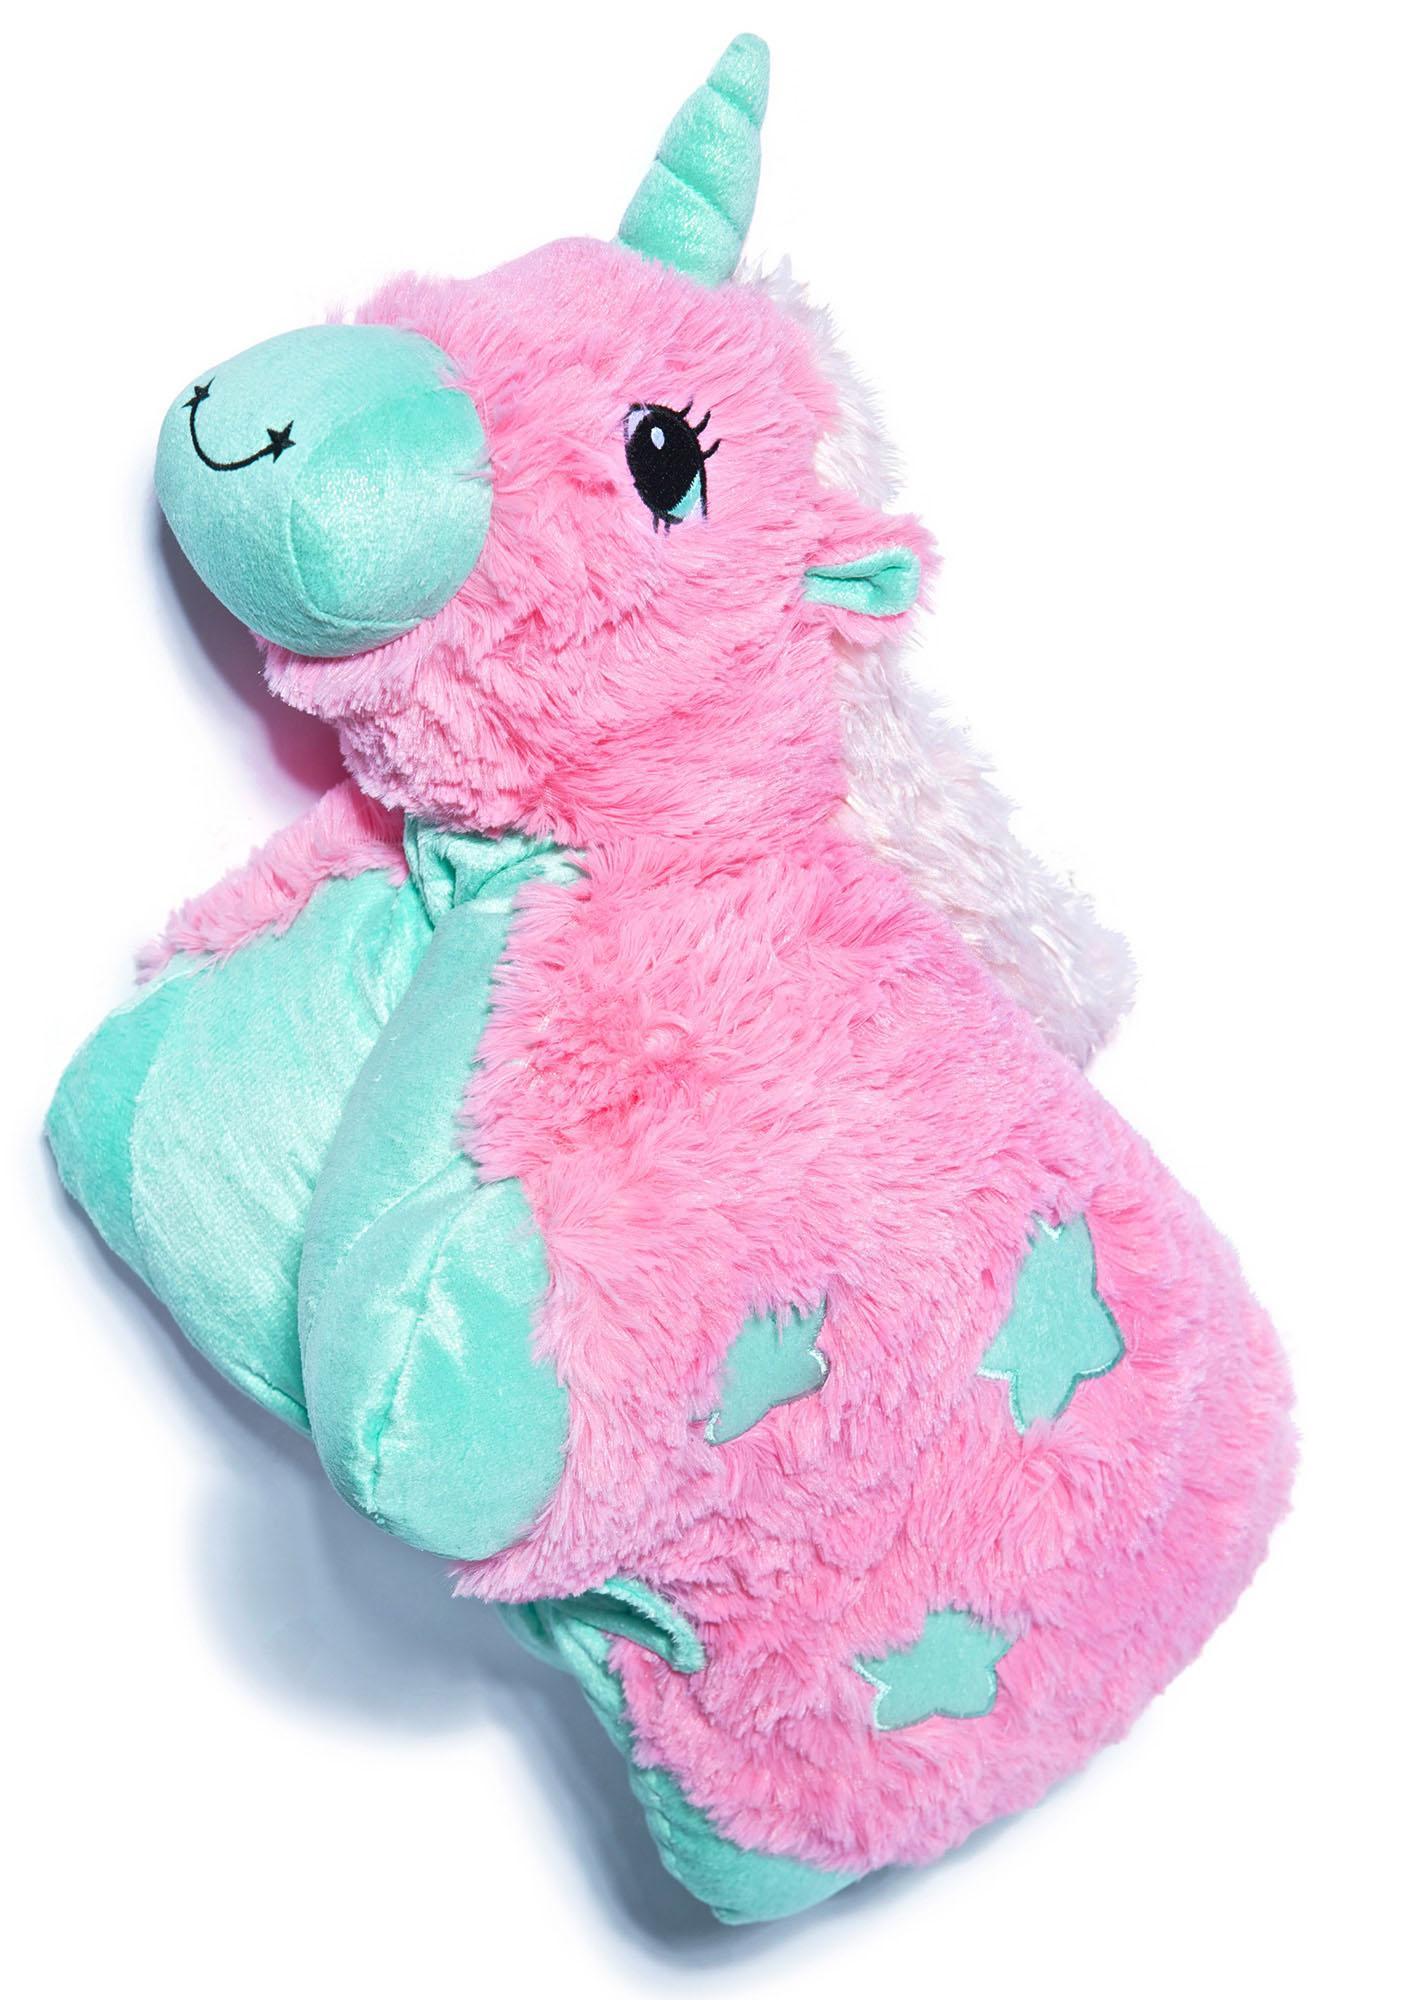 Pillow Pets Mystical Unicorn Pillow